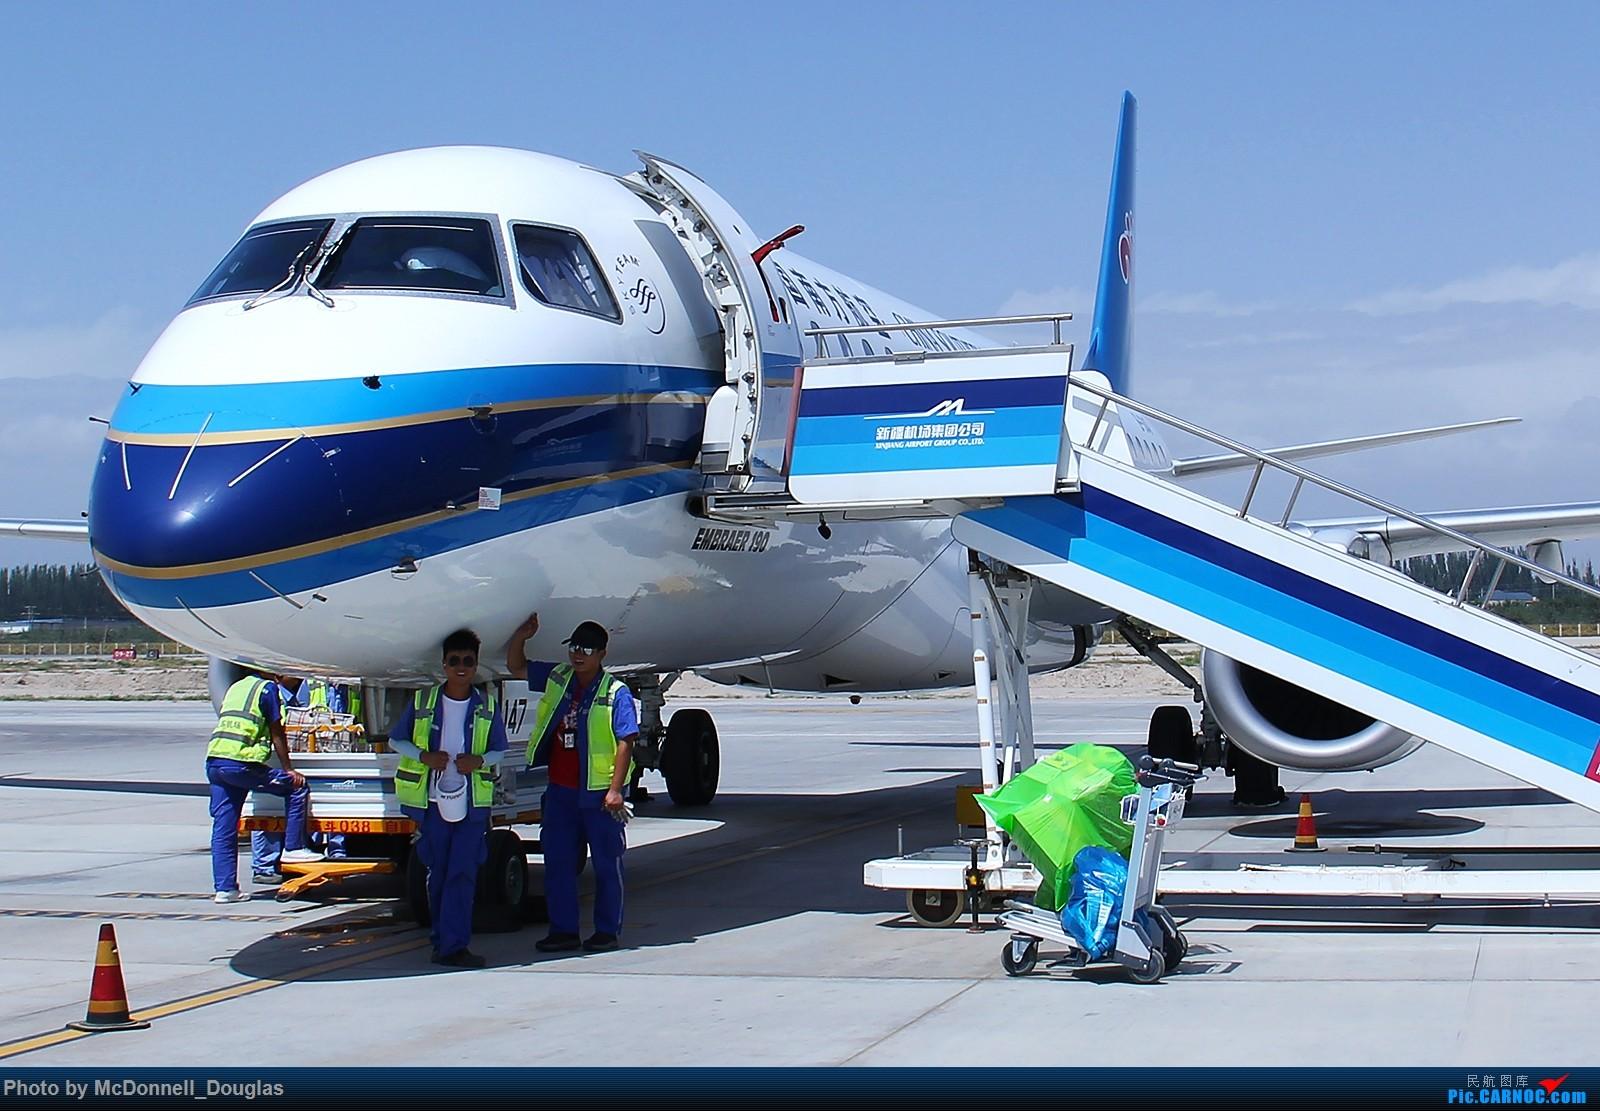 Re:[原创]【上海飞友会】【zc带你走天下(3)】再访祖辈年轻时工作的土地,父母年少时生活戈壁,跨越大半个中国去看新疆,回程小游蓉城(下) EMBRAER ERJ-190LR B-3147 中国阿克苏机场